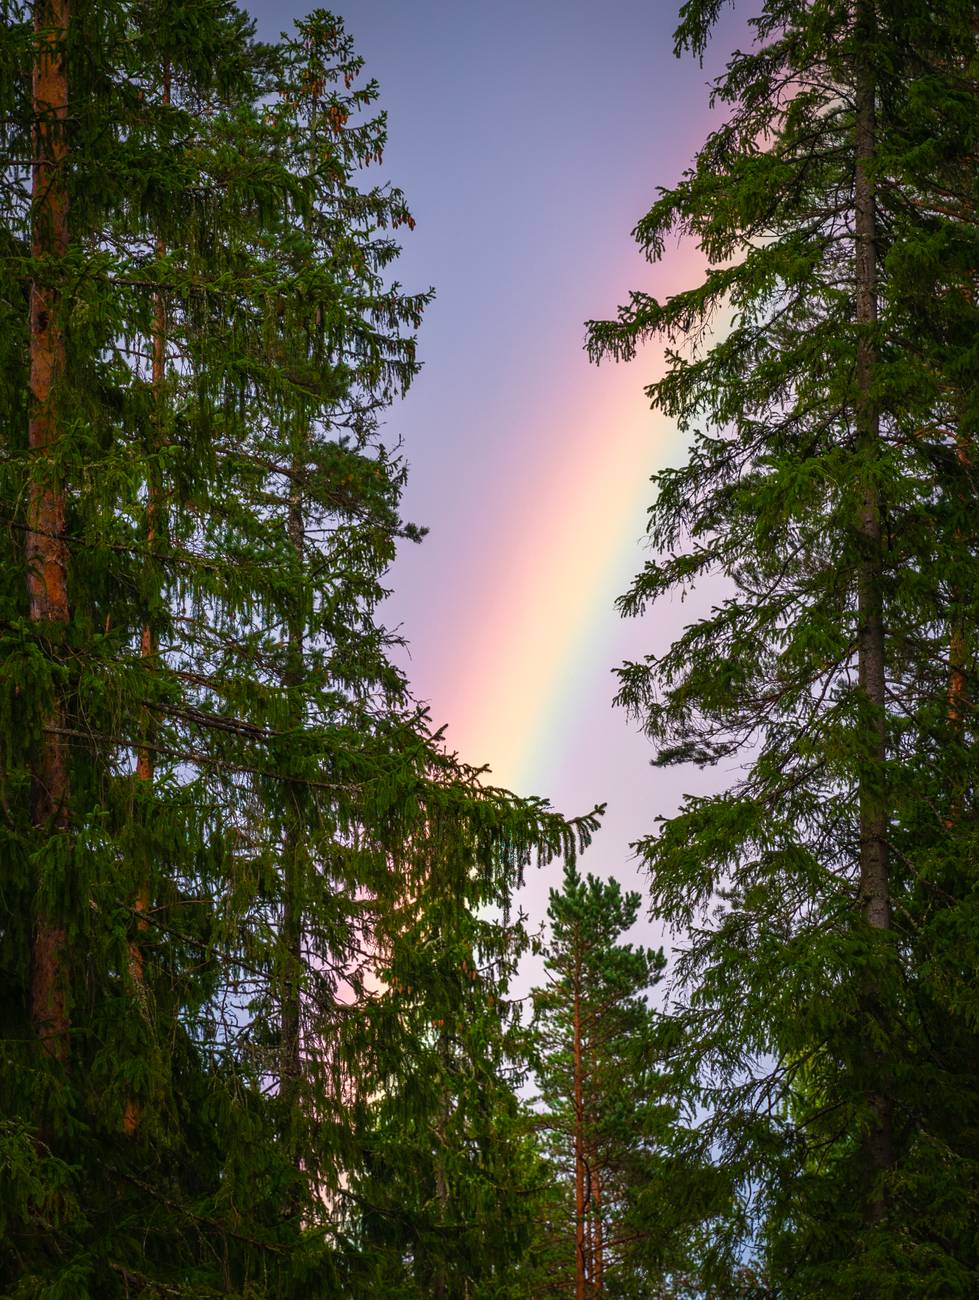 photo of trees and rainbow